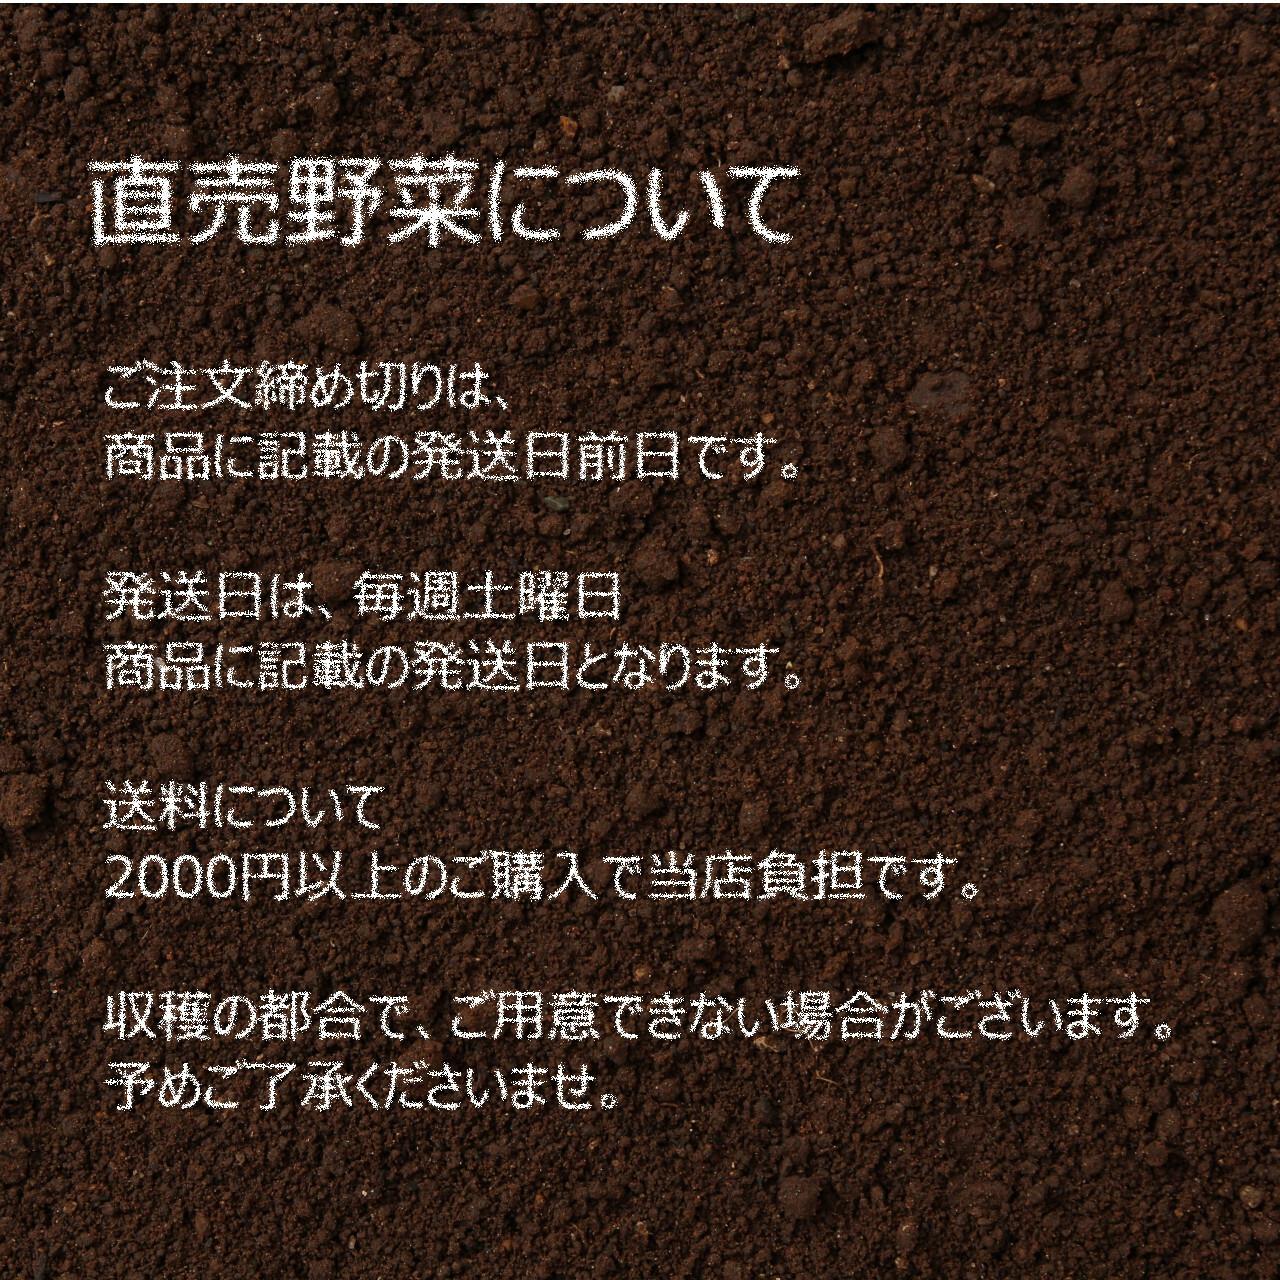 春の新鮮野菜 春菊 約200g : 5月の朝採り直売野菜 5月30日発送予定